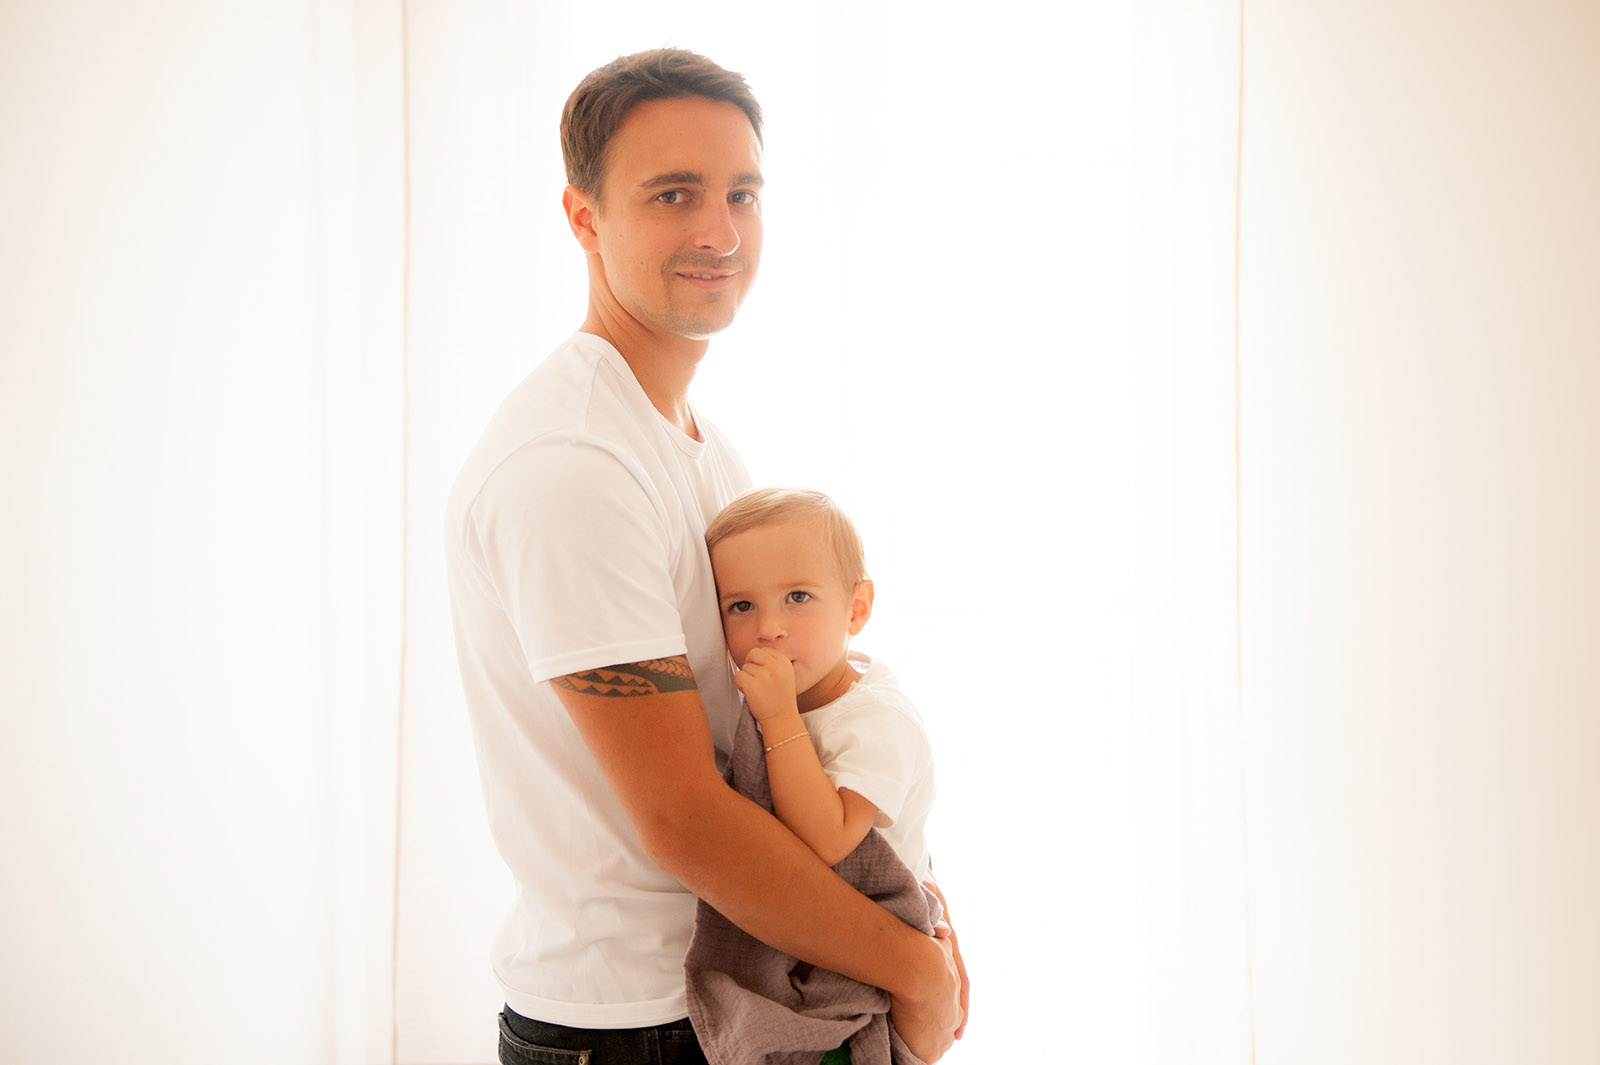 seance-photo-famille-photo-grossesse-photo-bébé-naissance-sabrina-godemert-photographe-seine-et-marne015